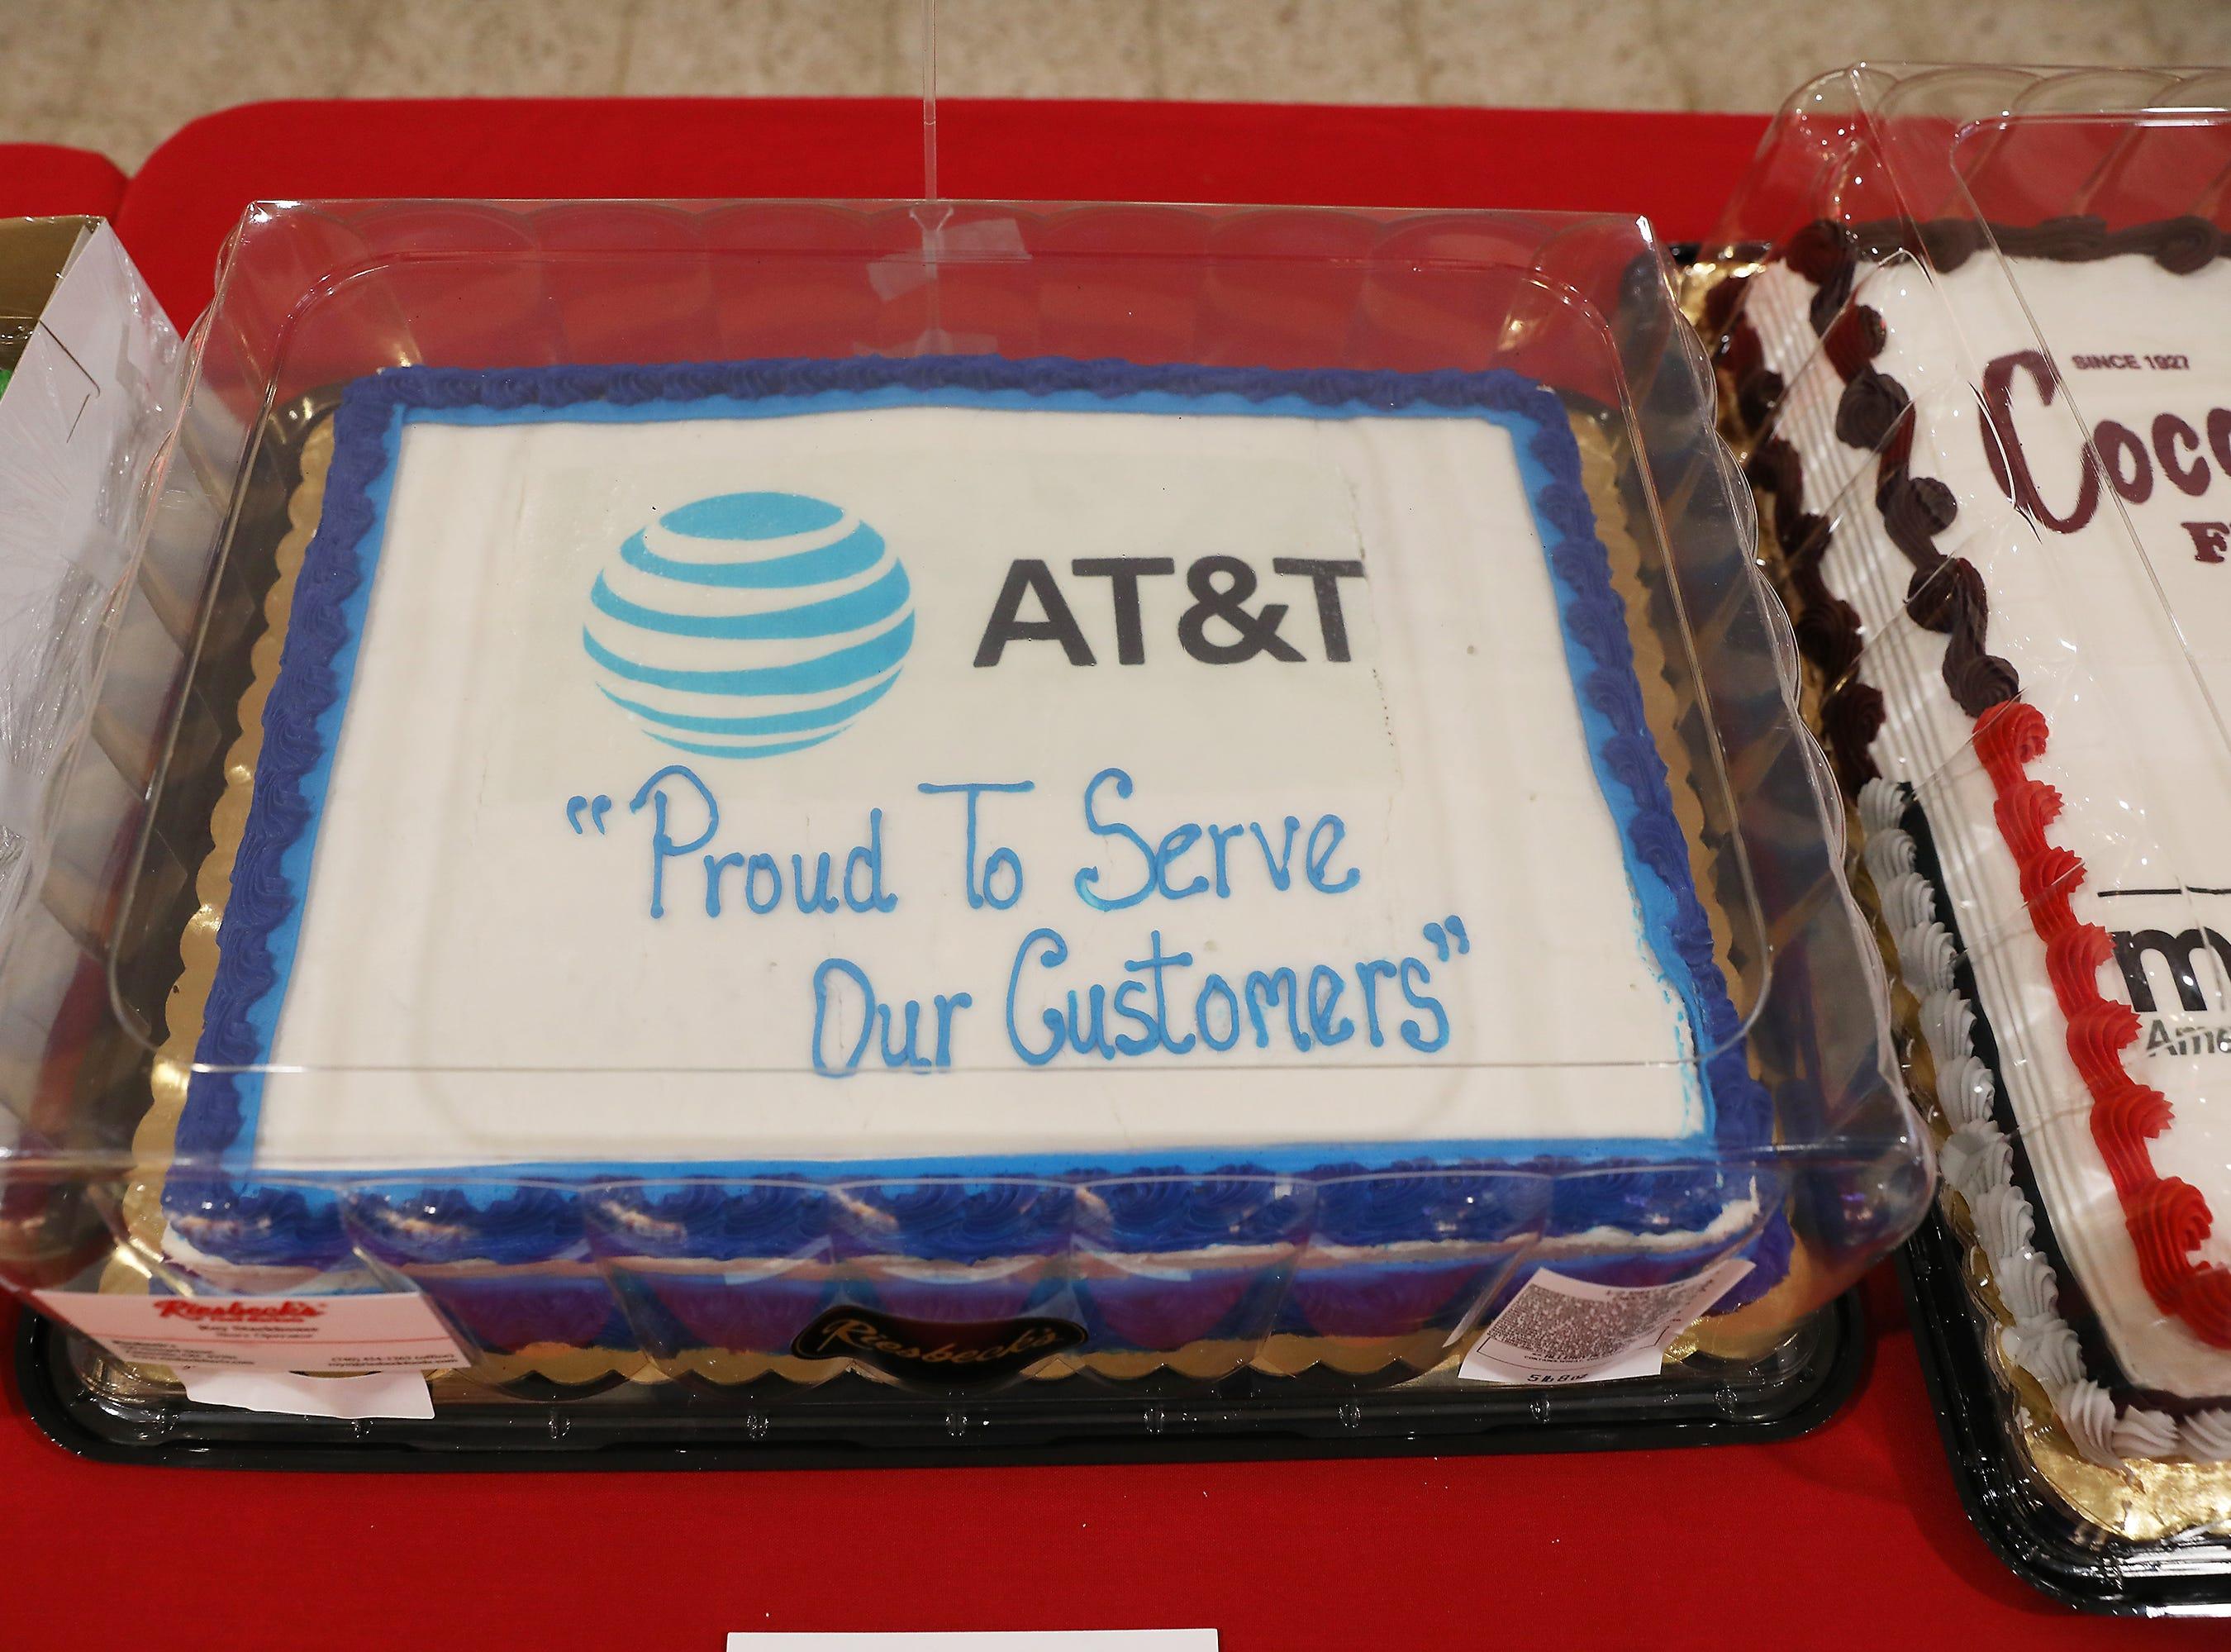 4:15 Friday cake 380 AT&T